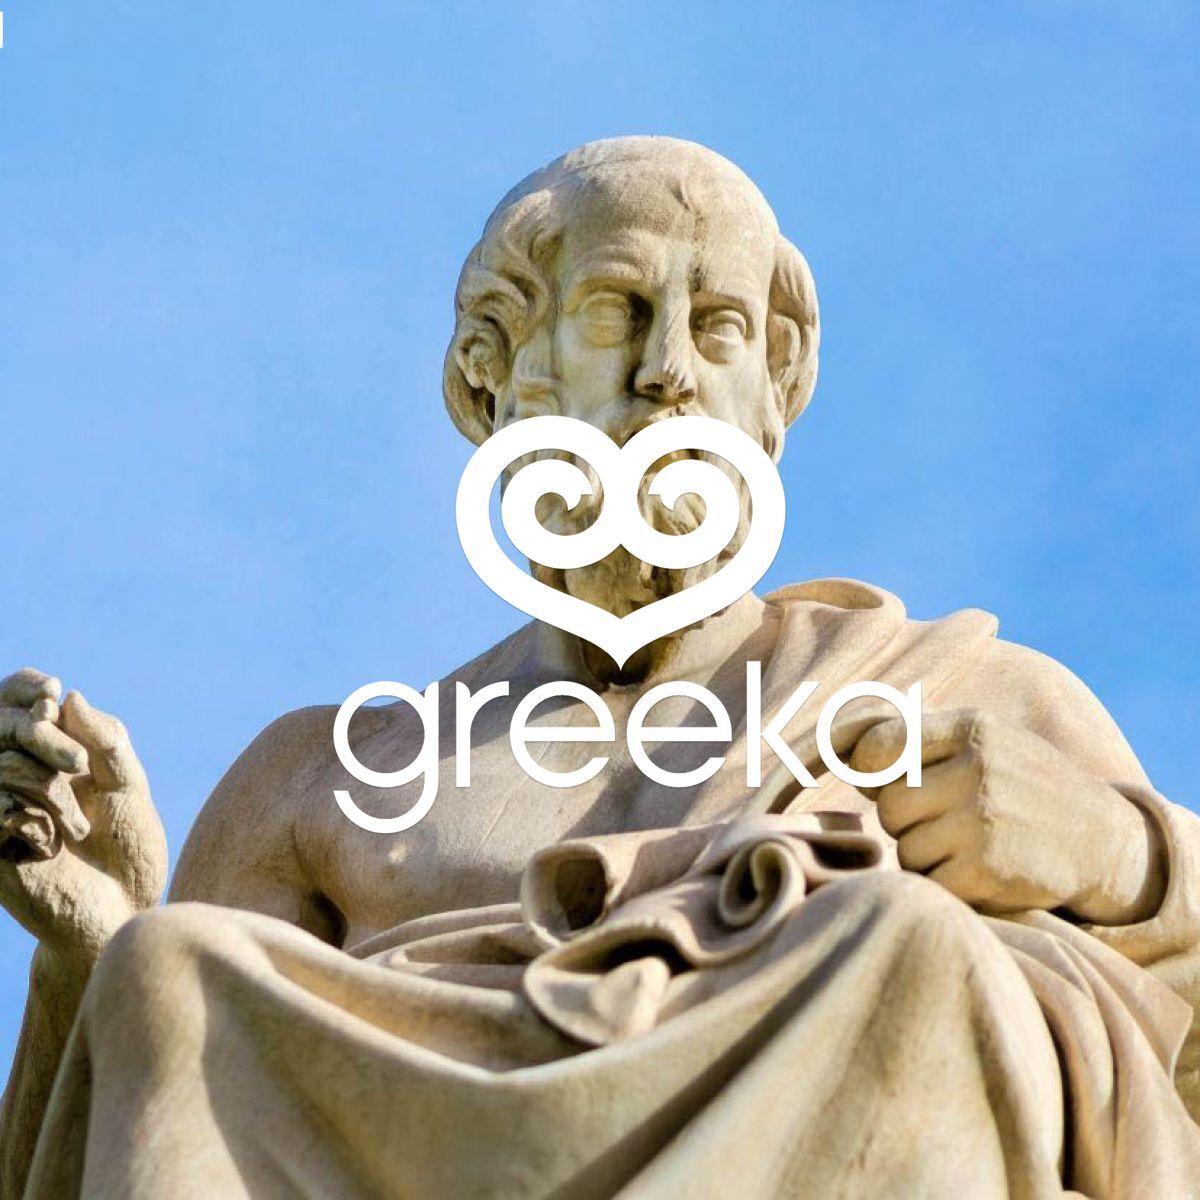 Famous Greek quotes list - Greeka.com